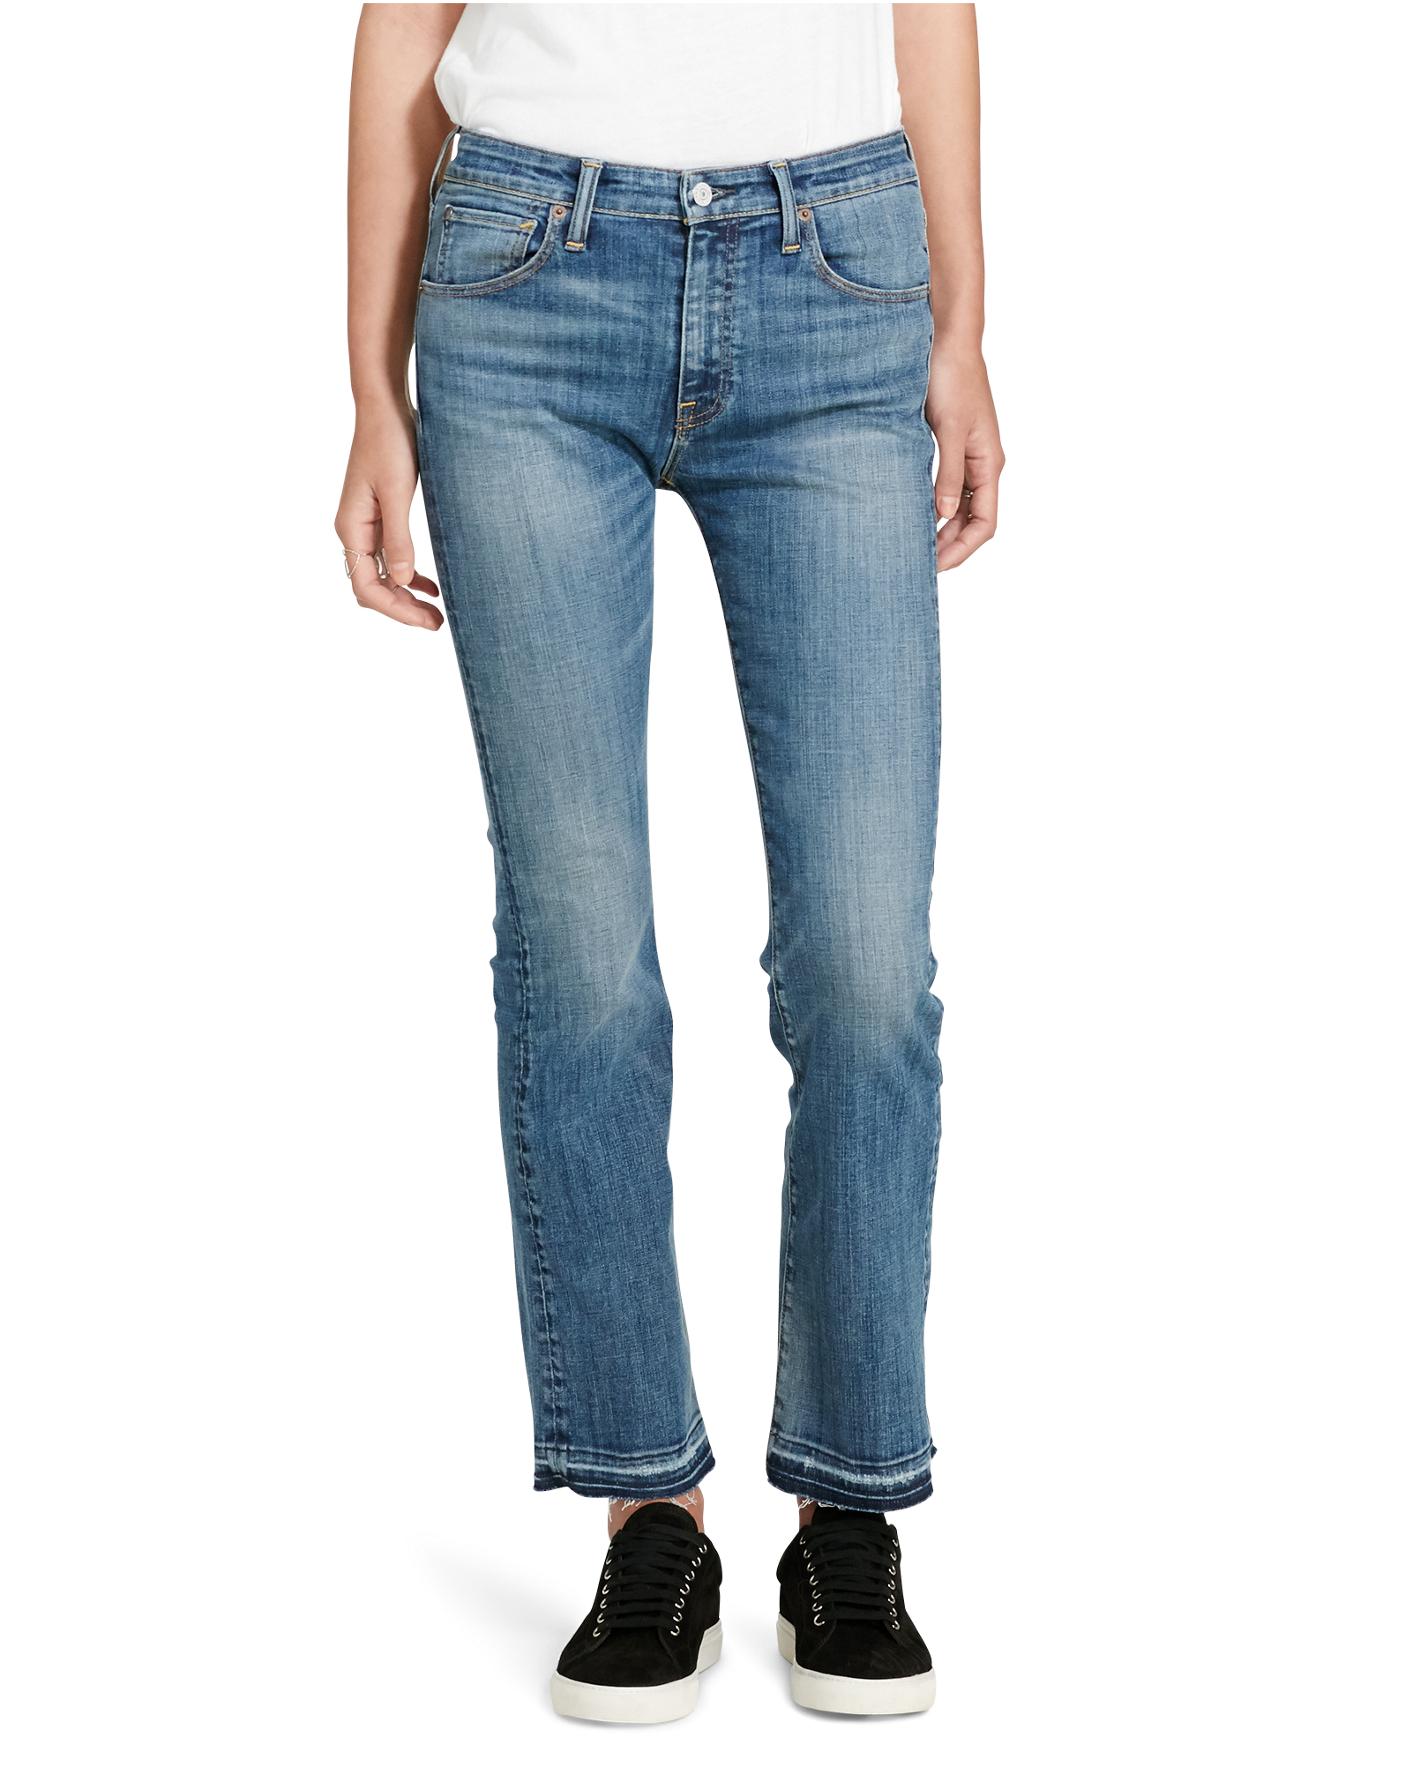 Women's Designer Wide Leg & Flare Jeans | Ralph Lauren